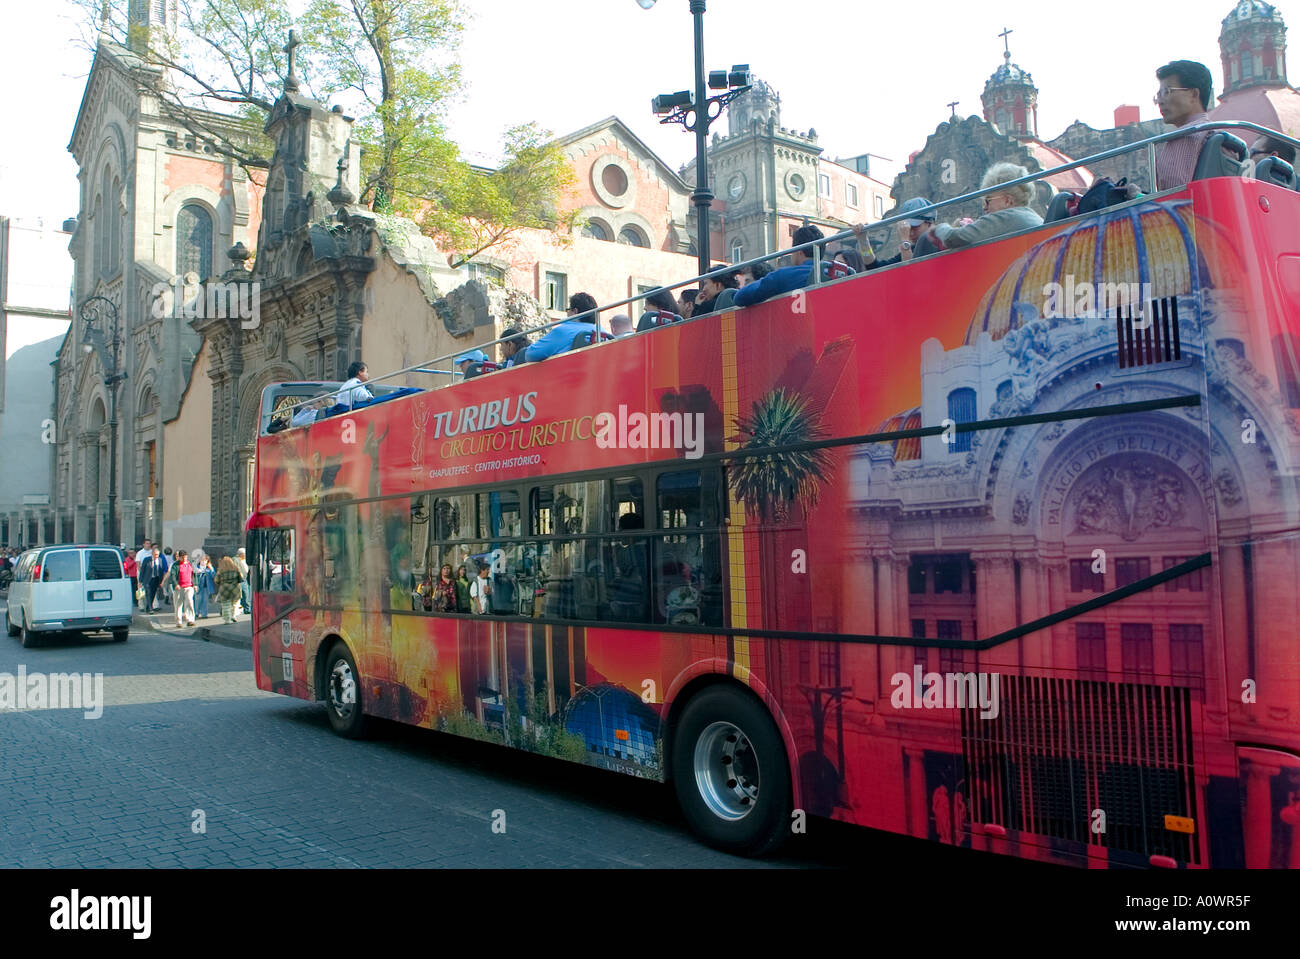 Circuito Turistico : Livro circuito turístico religioso sebrae sp r em